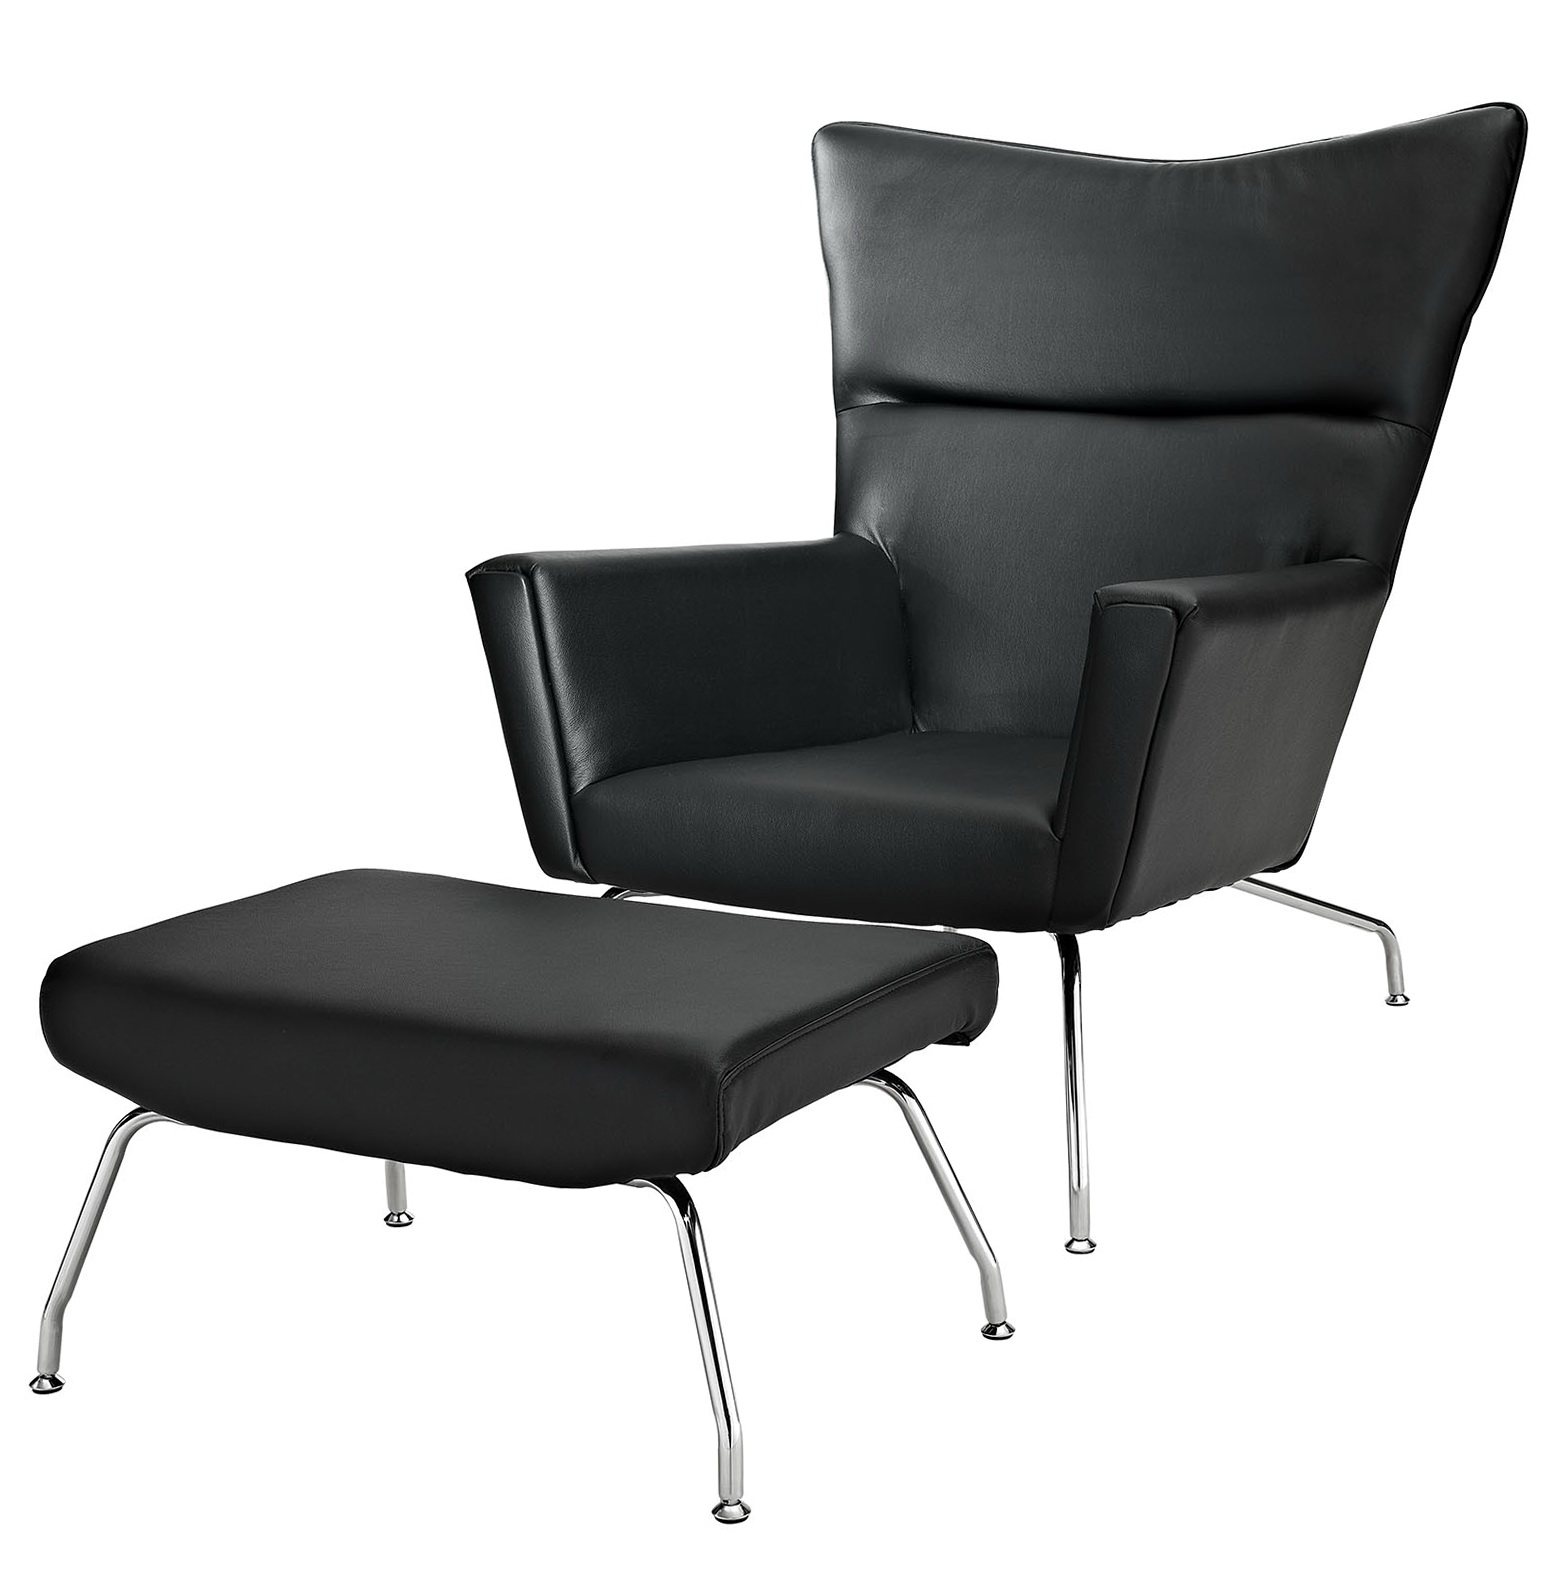 black chair and ottoman tommy bahamas beach leather home design ideas